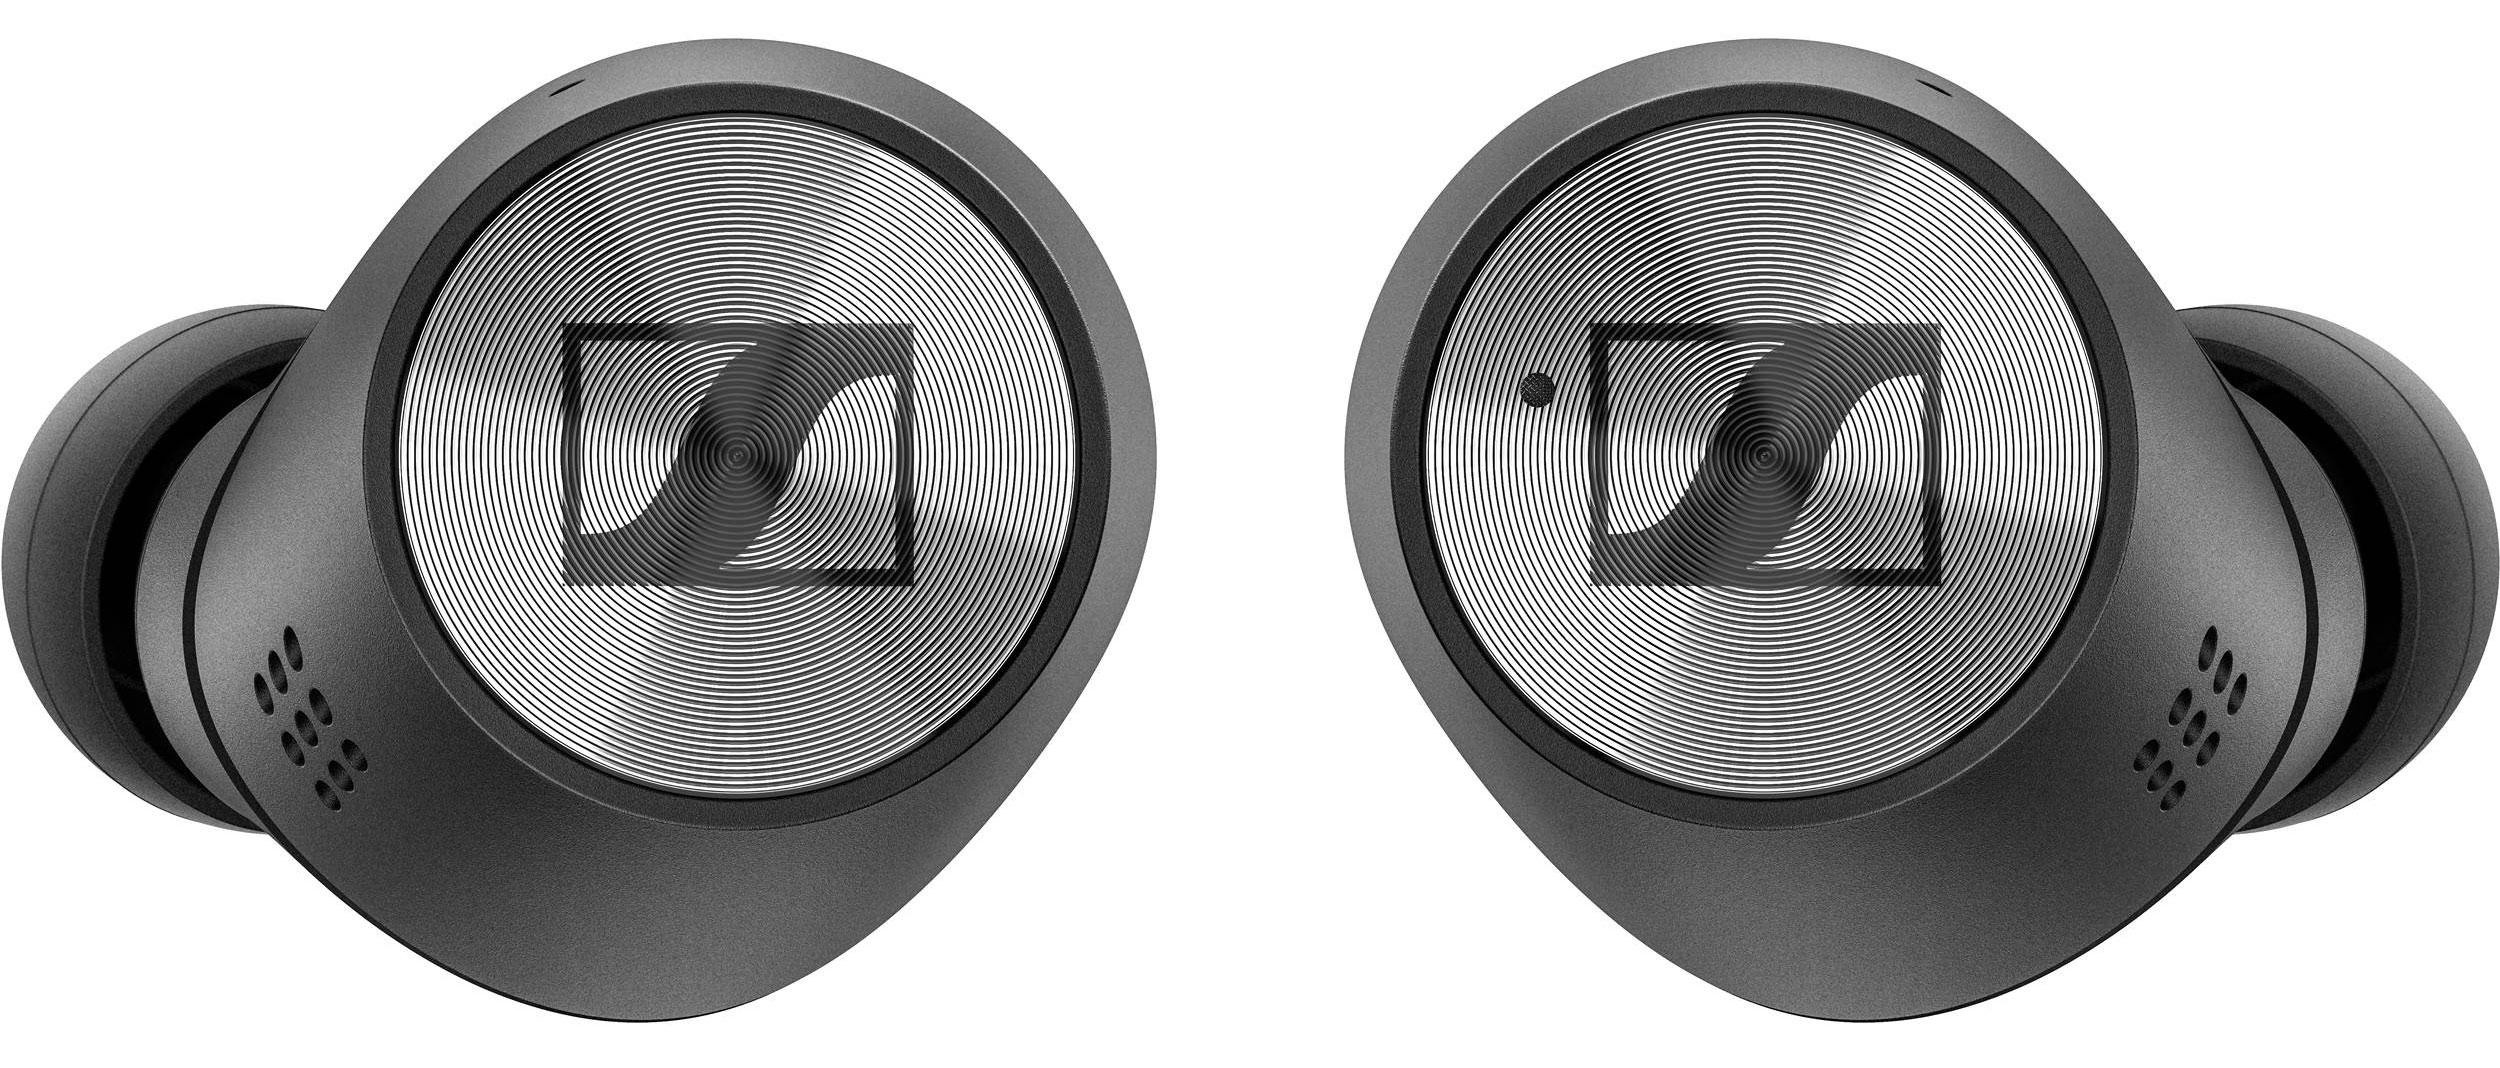 Sennheiser MOMENTUM True Wireless 2 Noise-Canceling In-Ear Headphones